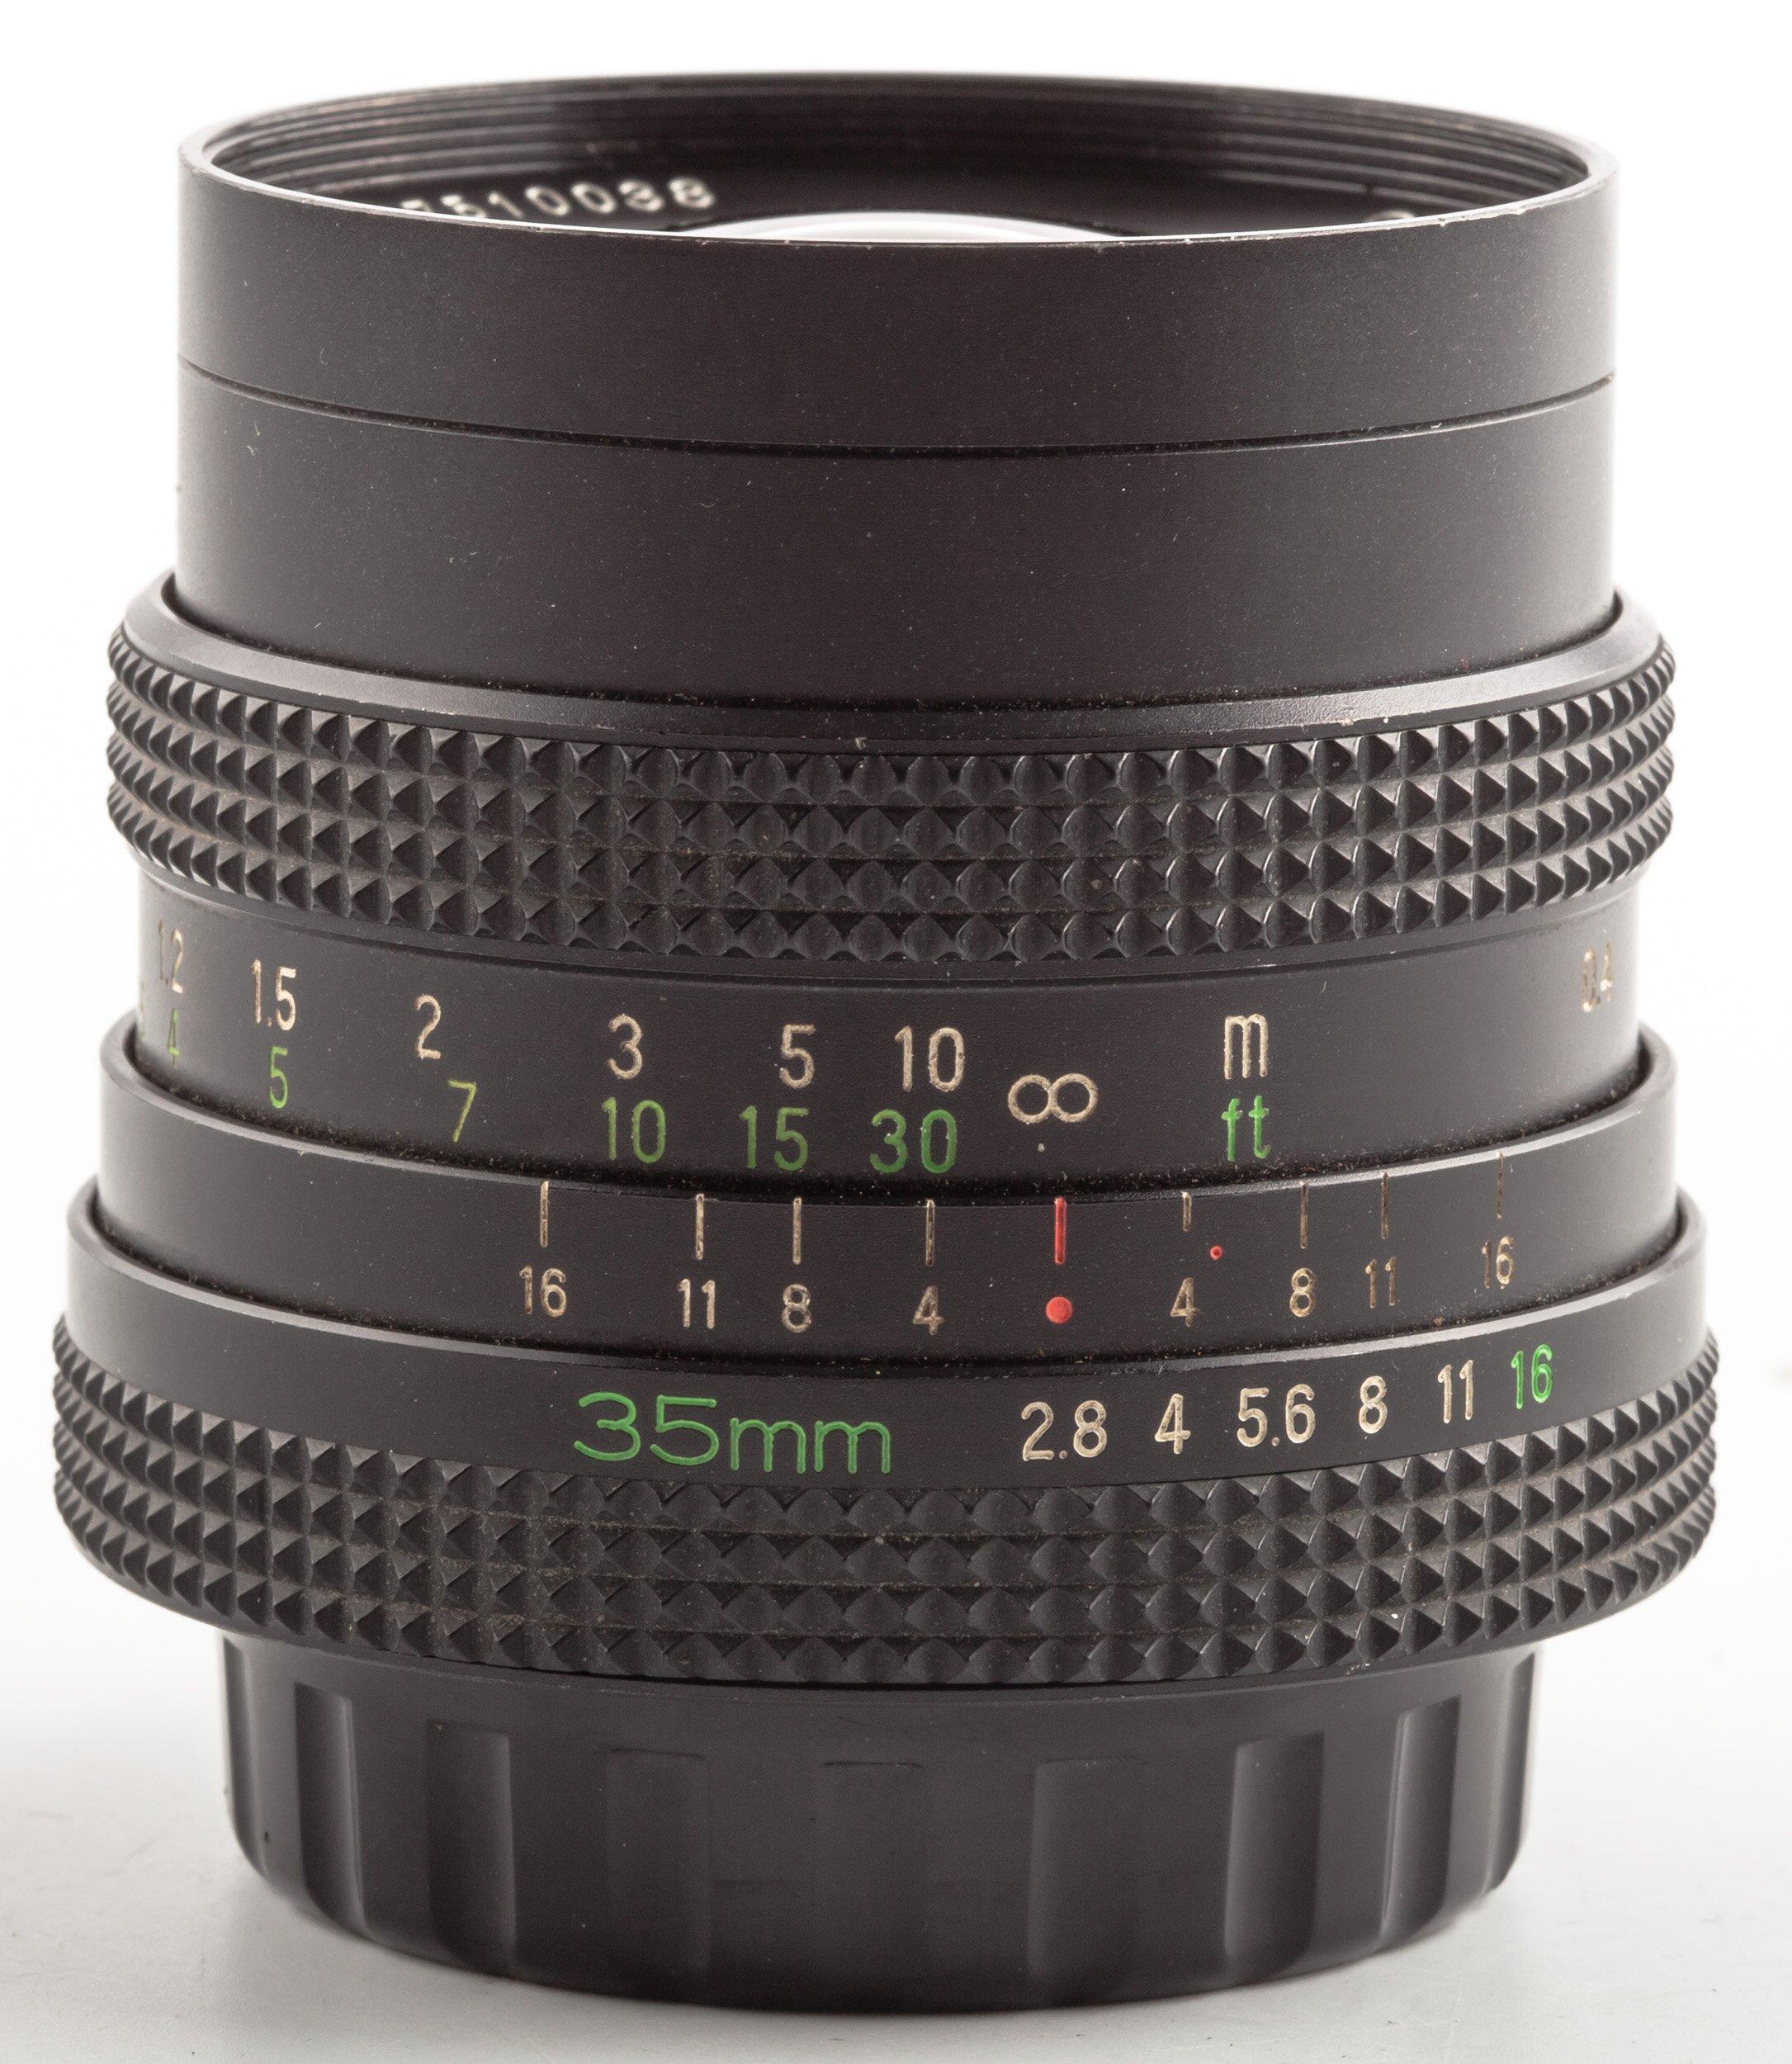 Rollei SLR 35mm F2.8 Rolleinar MC